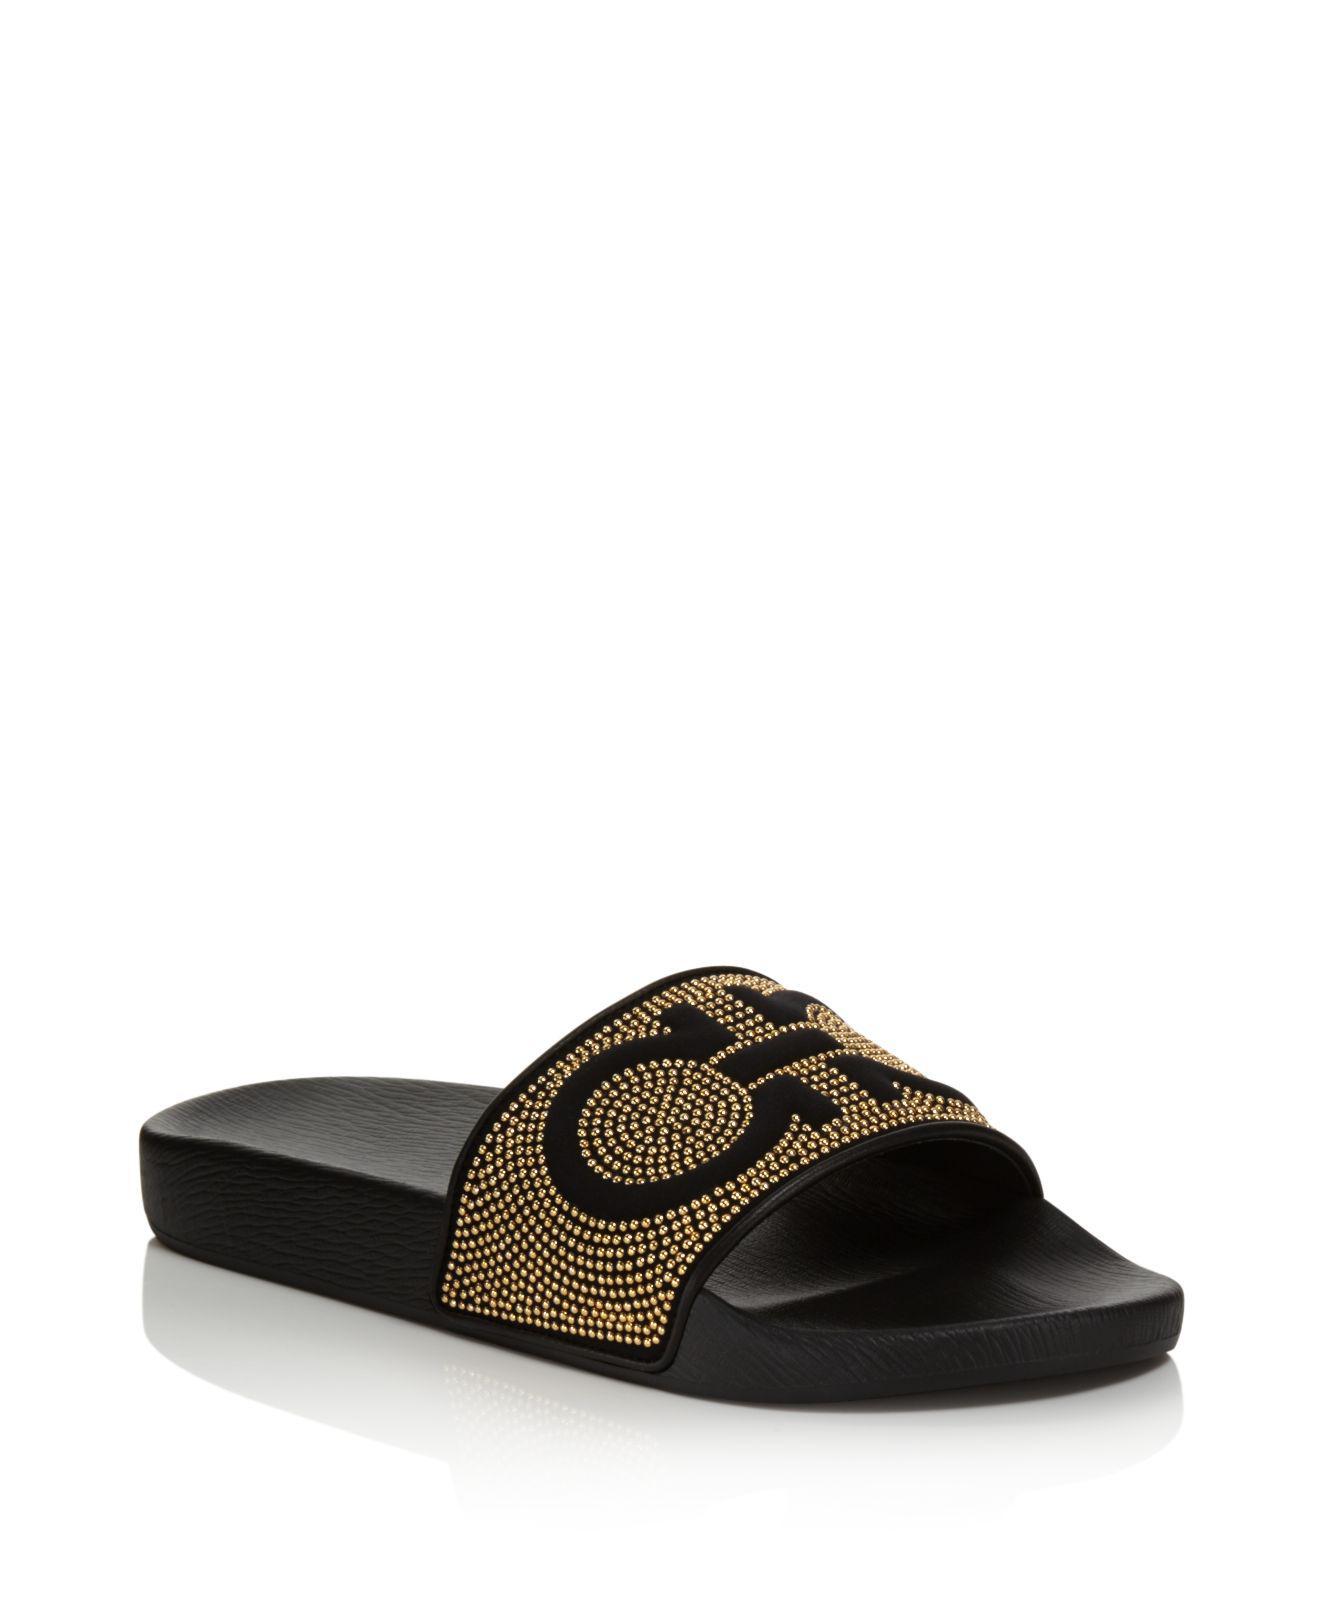 3ea51766a Ferragamo Women's Groove Studded Pool Slide Sandals in Black - Lyst